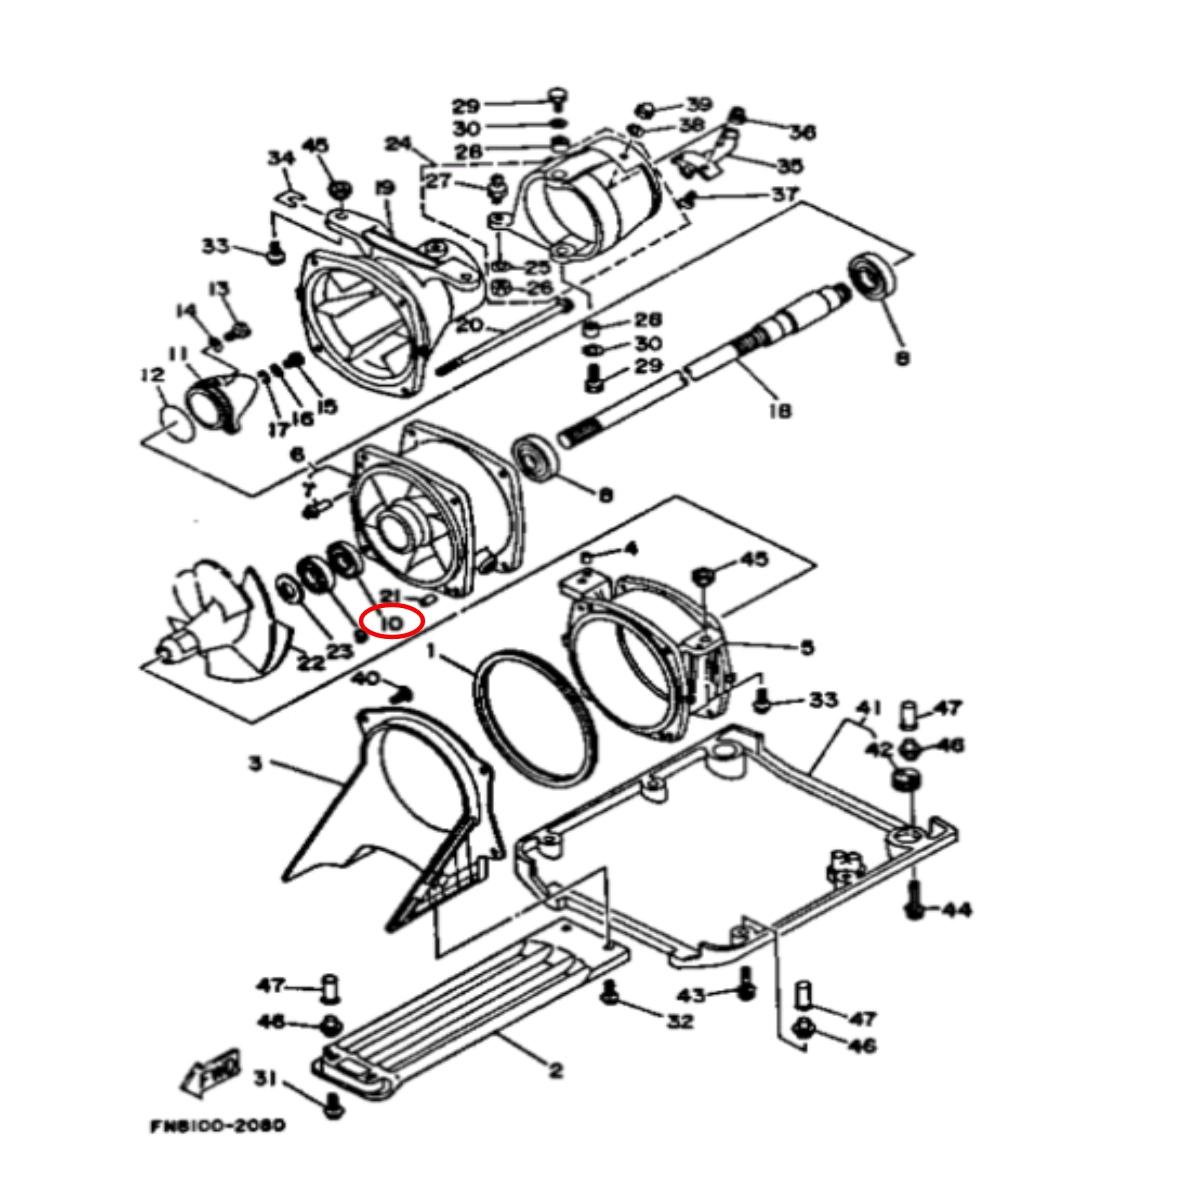 Retentor Turbina Frente para Jet Ski Yamaha XLT  - Radical Peças - Peças para Jet Ski